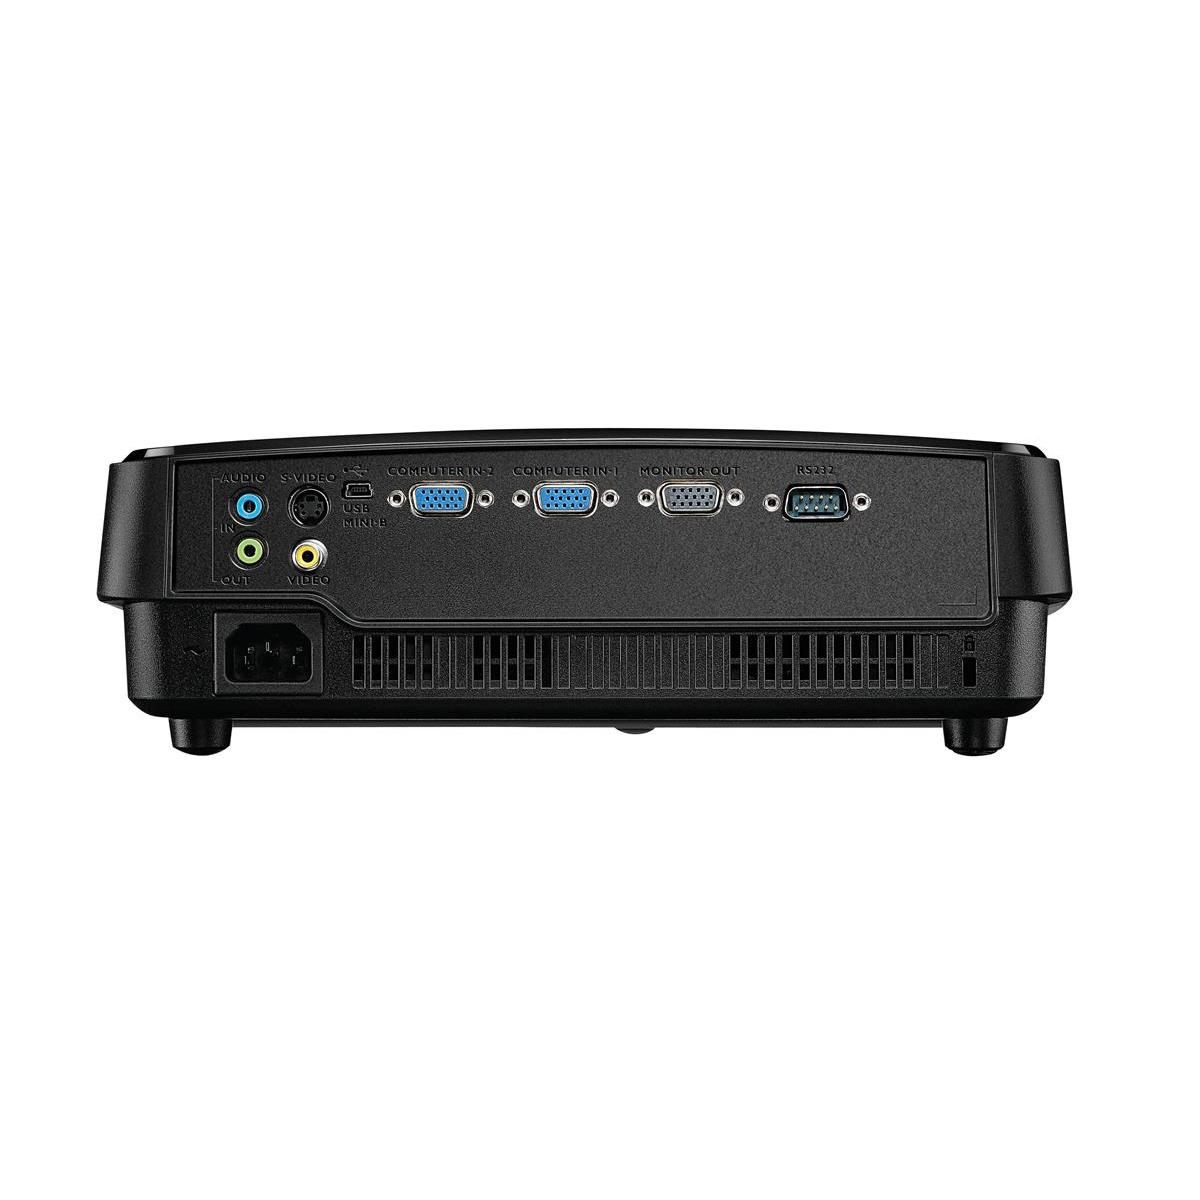 BenQ MS506 Projector SVGA 3200 ANSI Lumens 13000-1 Contrast Ratio Black Ref MS506